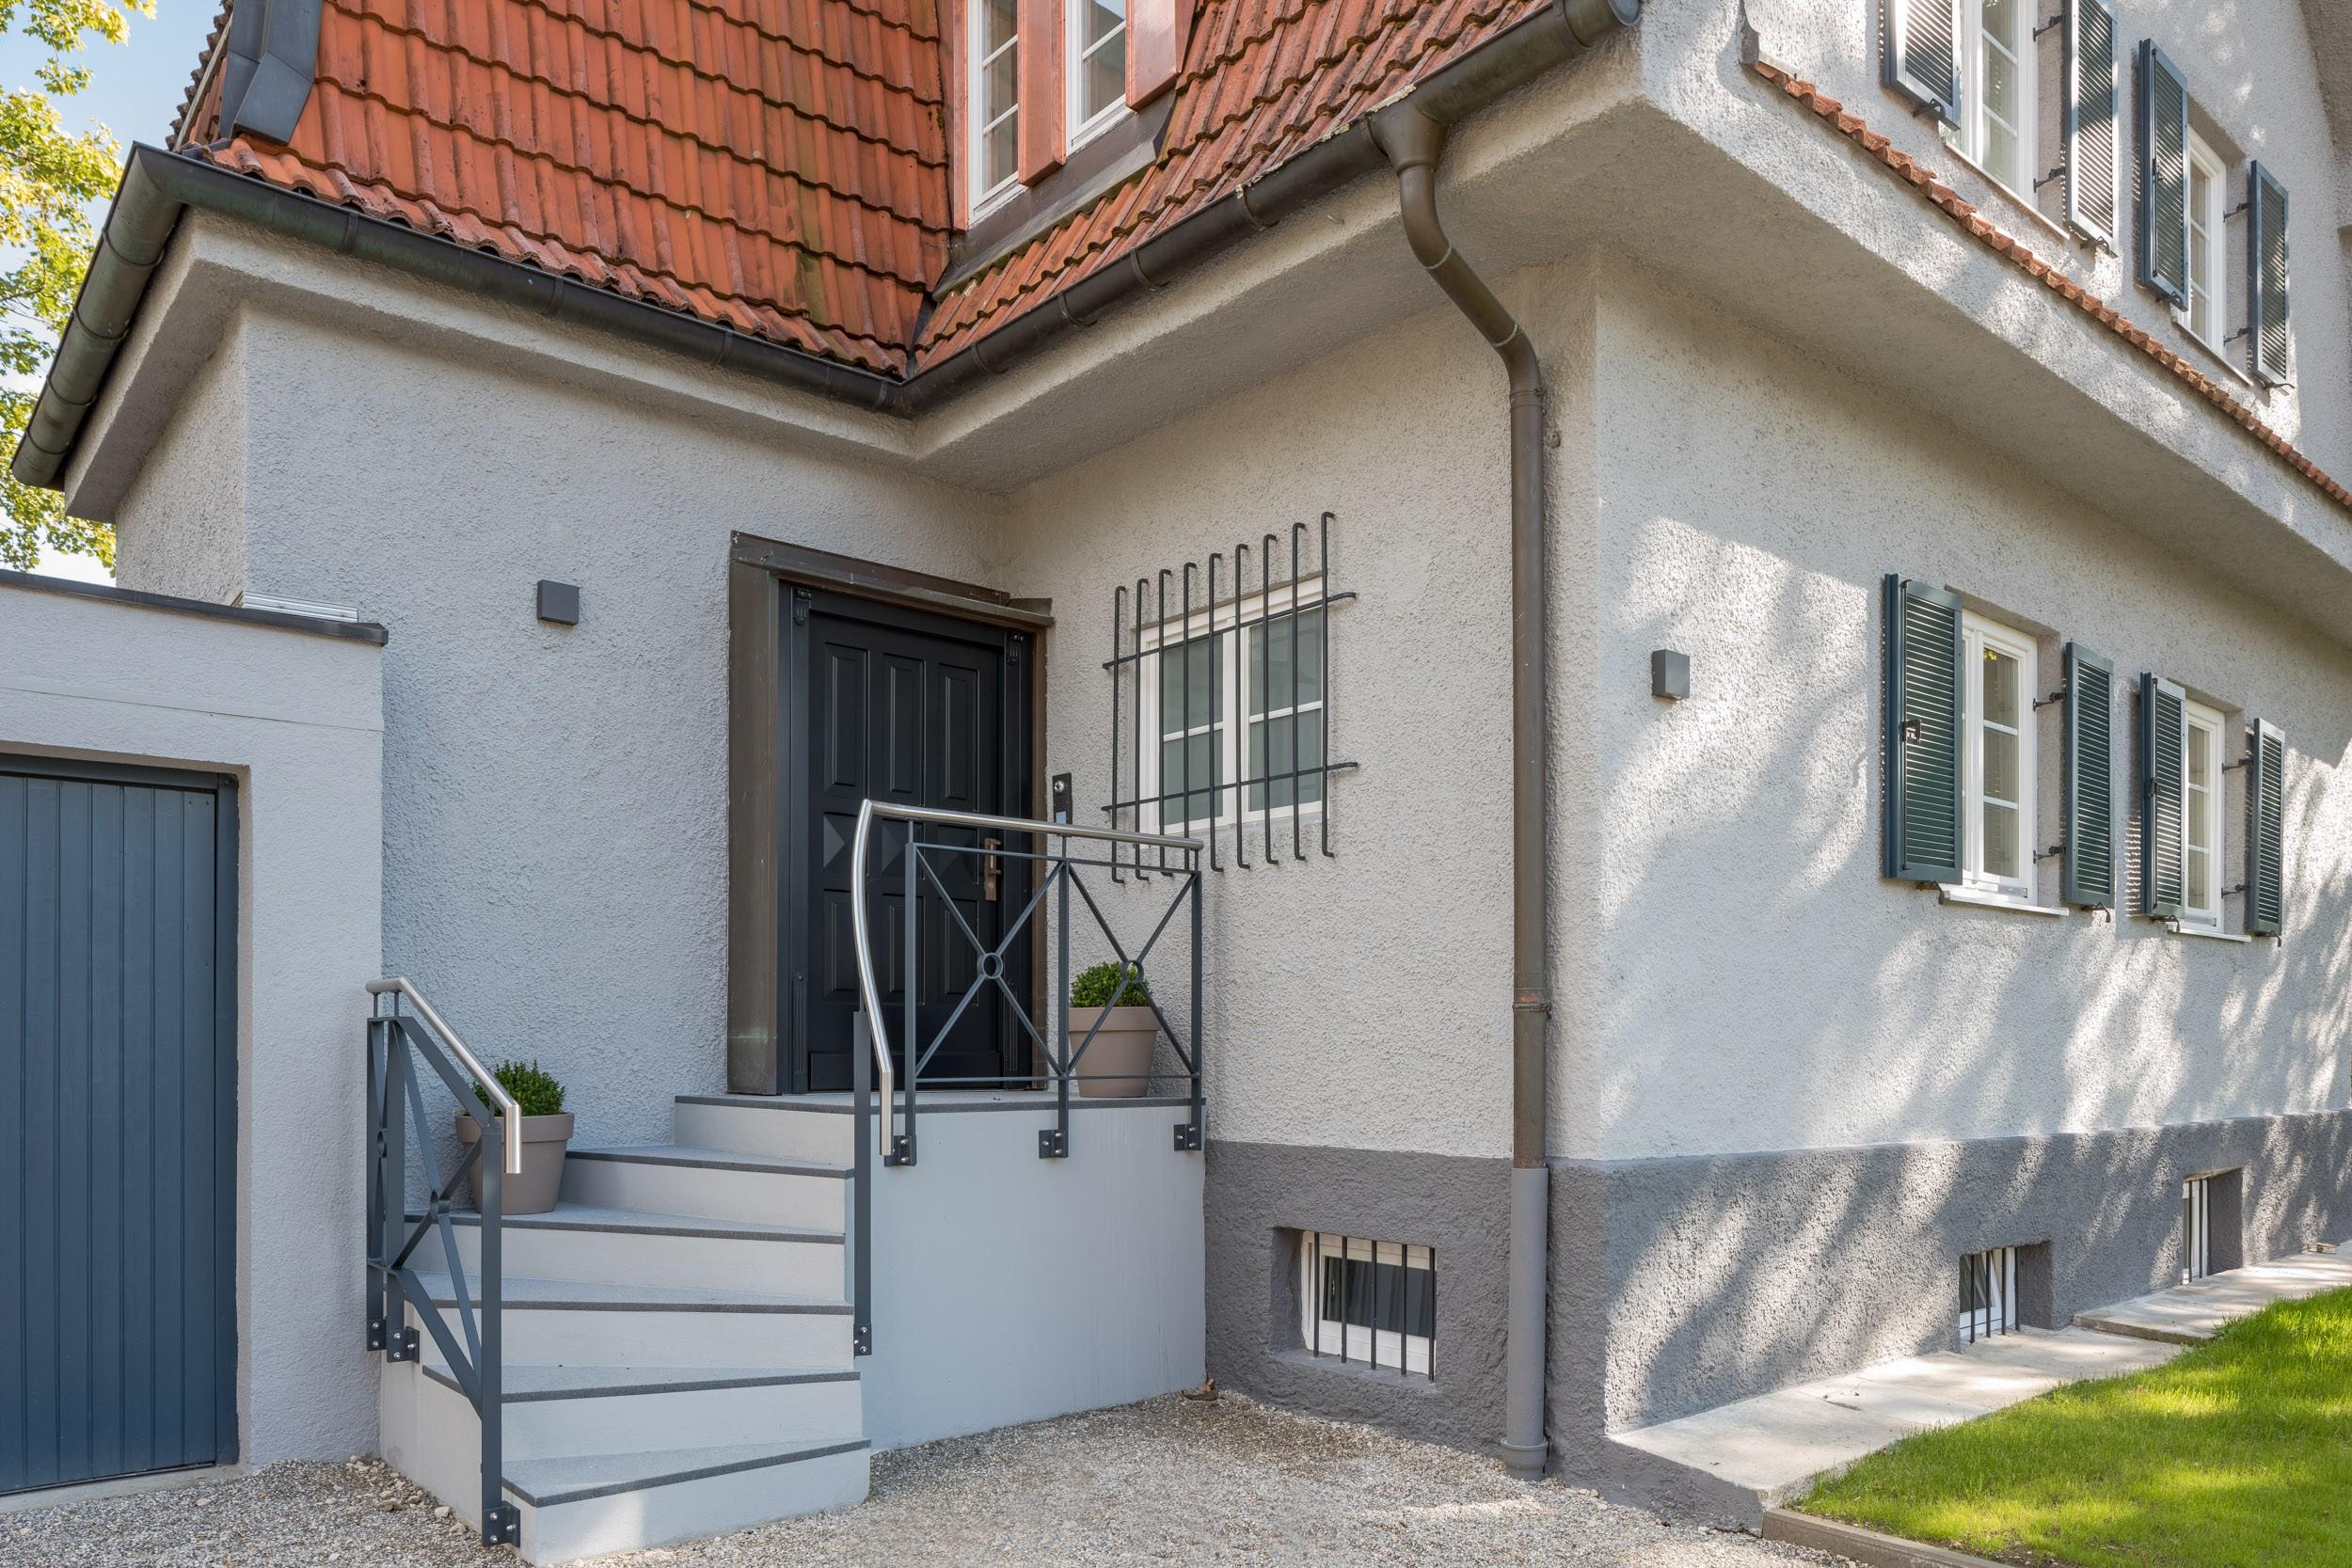 luxery properties munich -Quartier Acht- best property agent for exclusive properties in Munich / Gruenwald Immobilienmakler München/Grünwald exklusive Immobilien